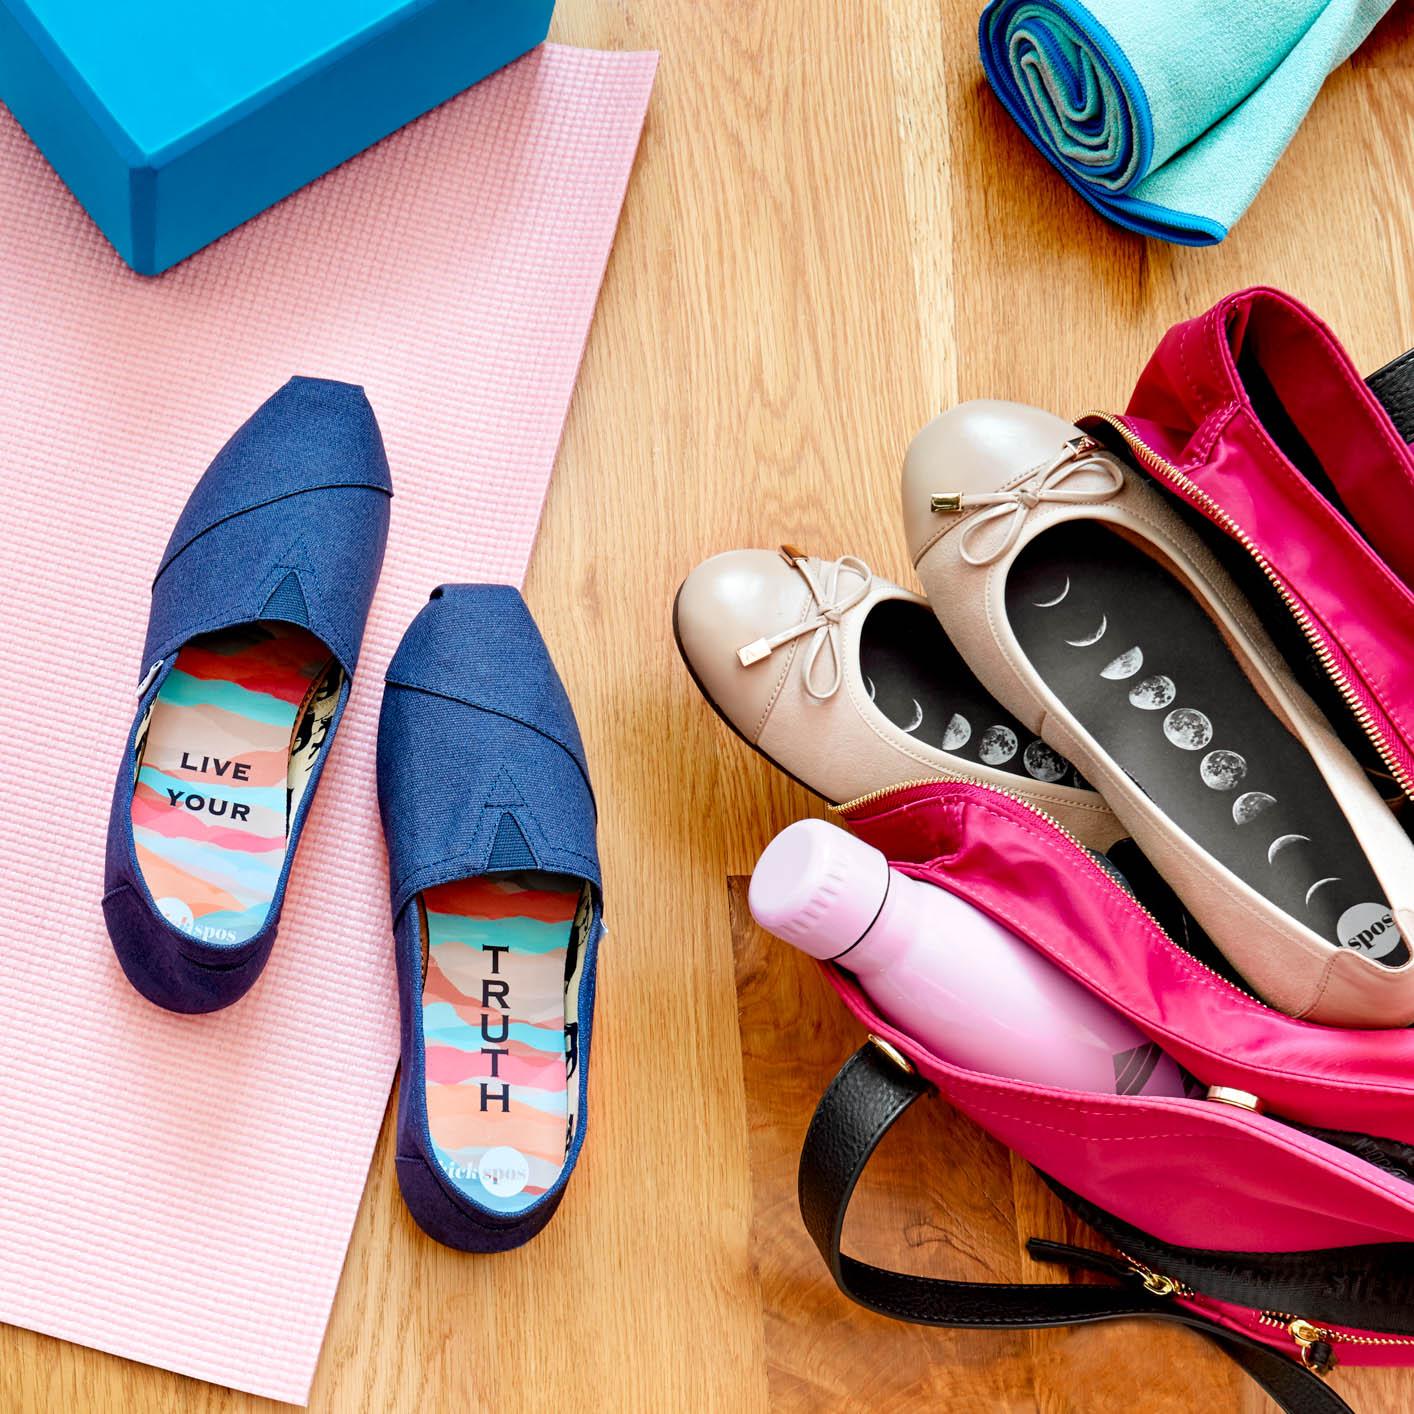 kickspos-brand-photography-shoes-insoles-2.jpg